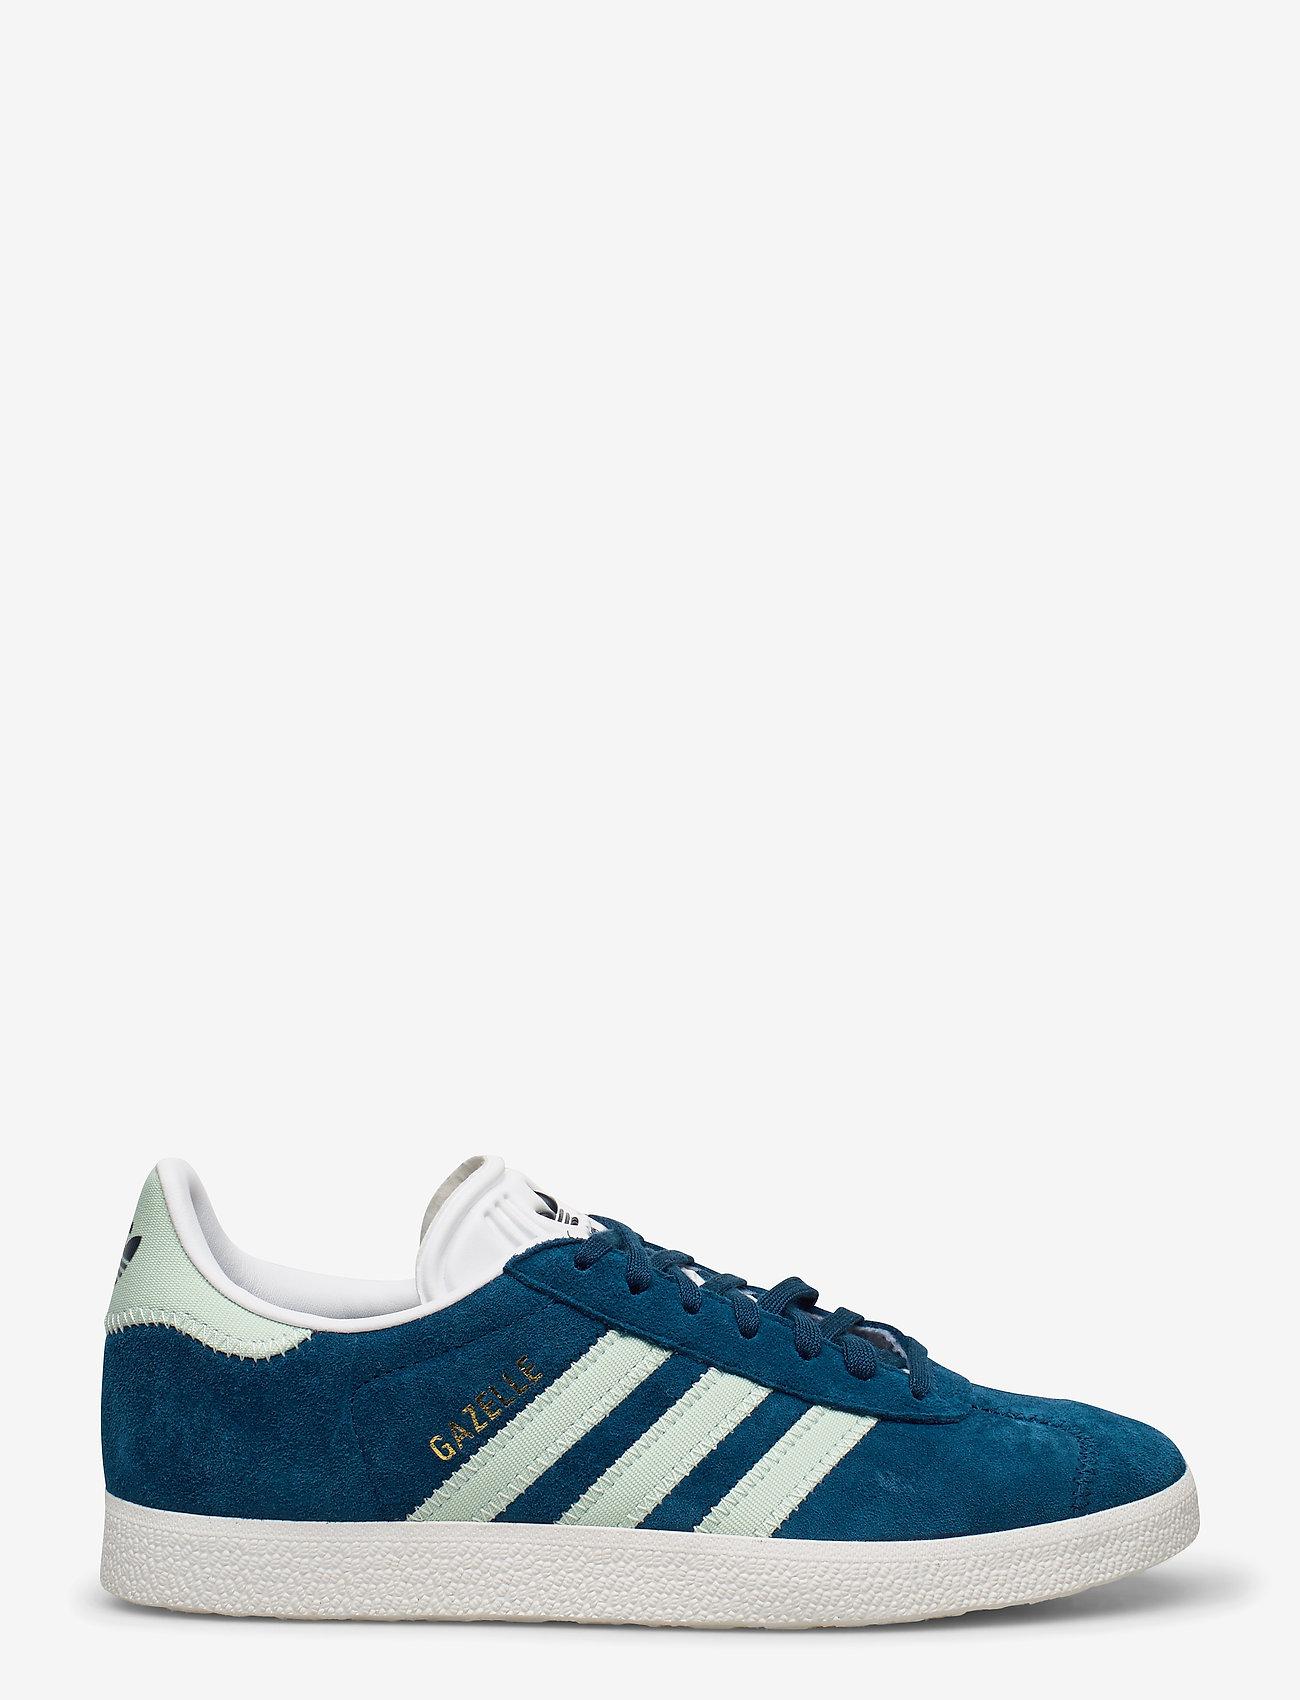 Adidas Originals Gazelle W - Sneakers